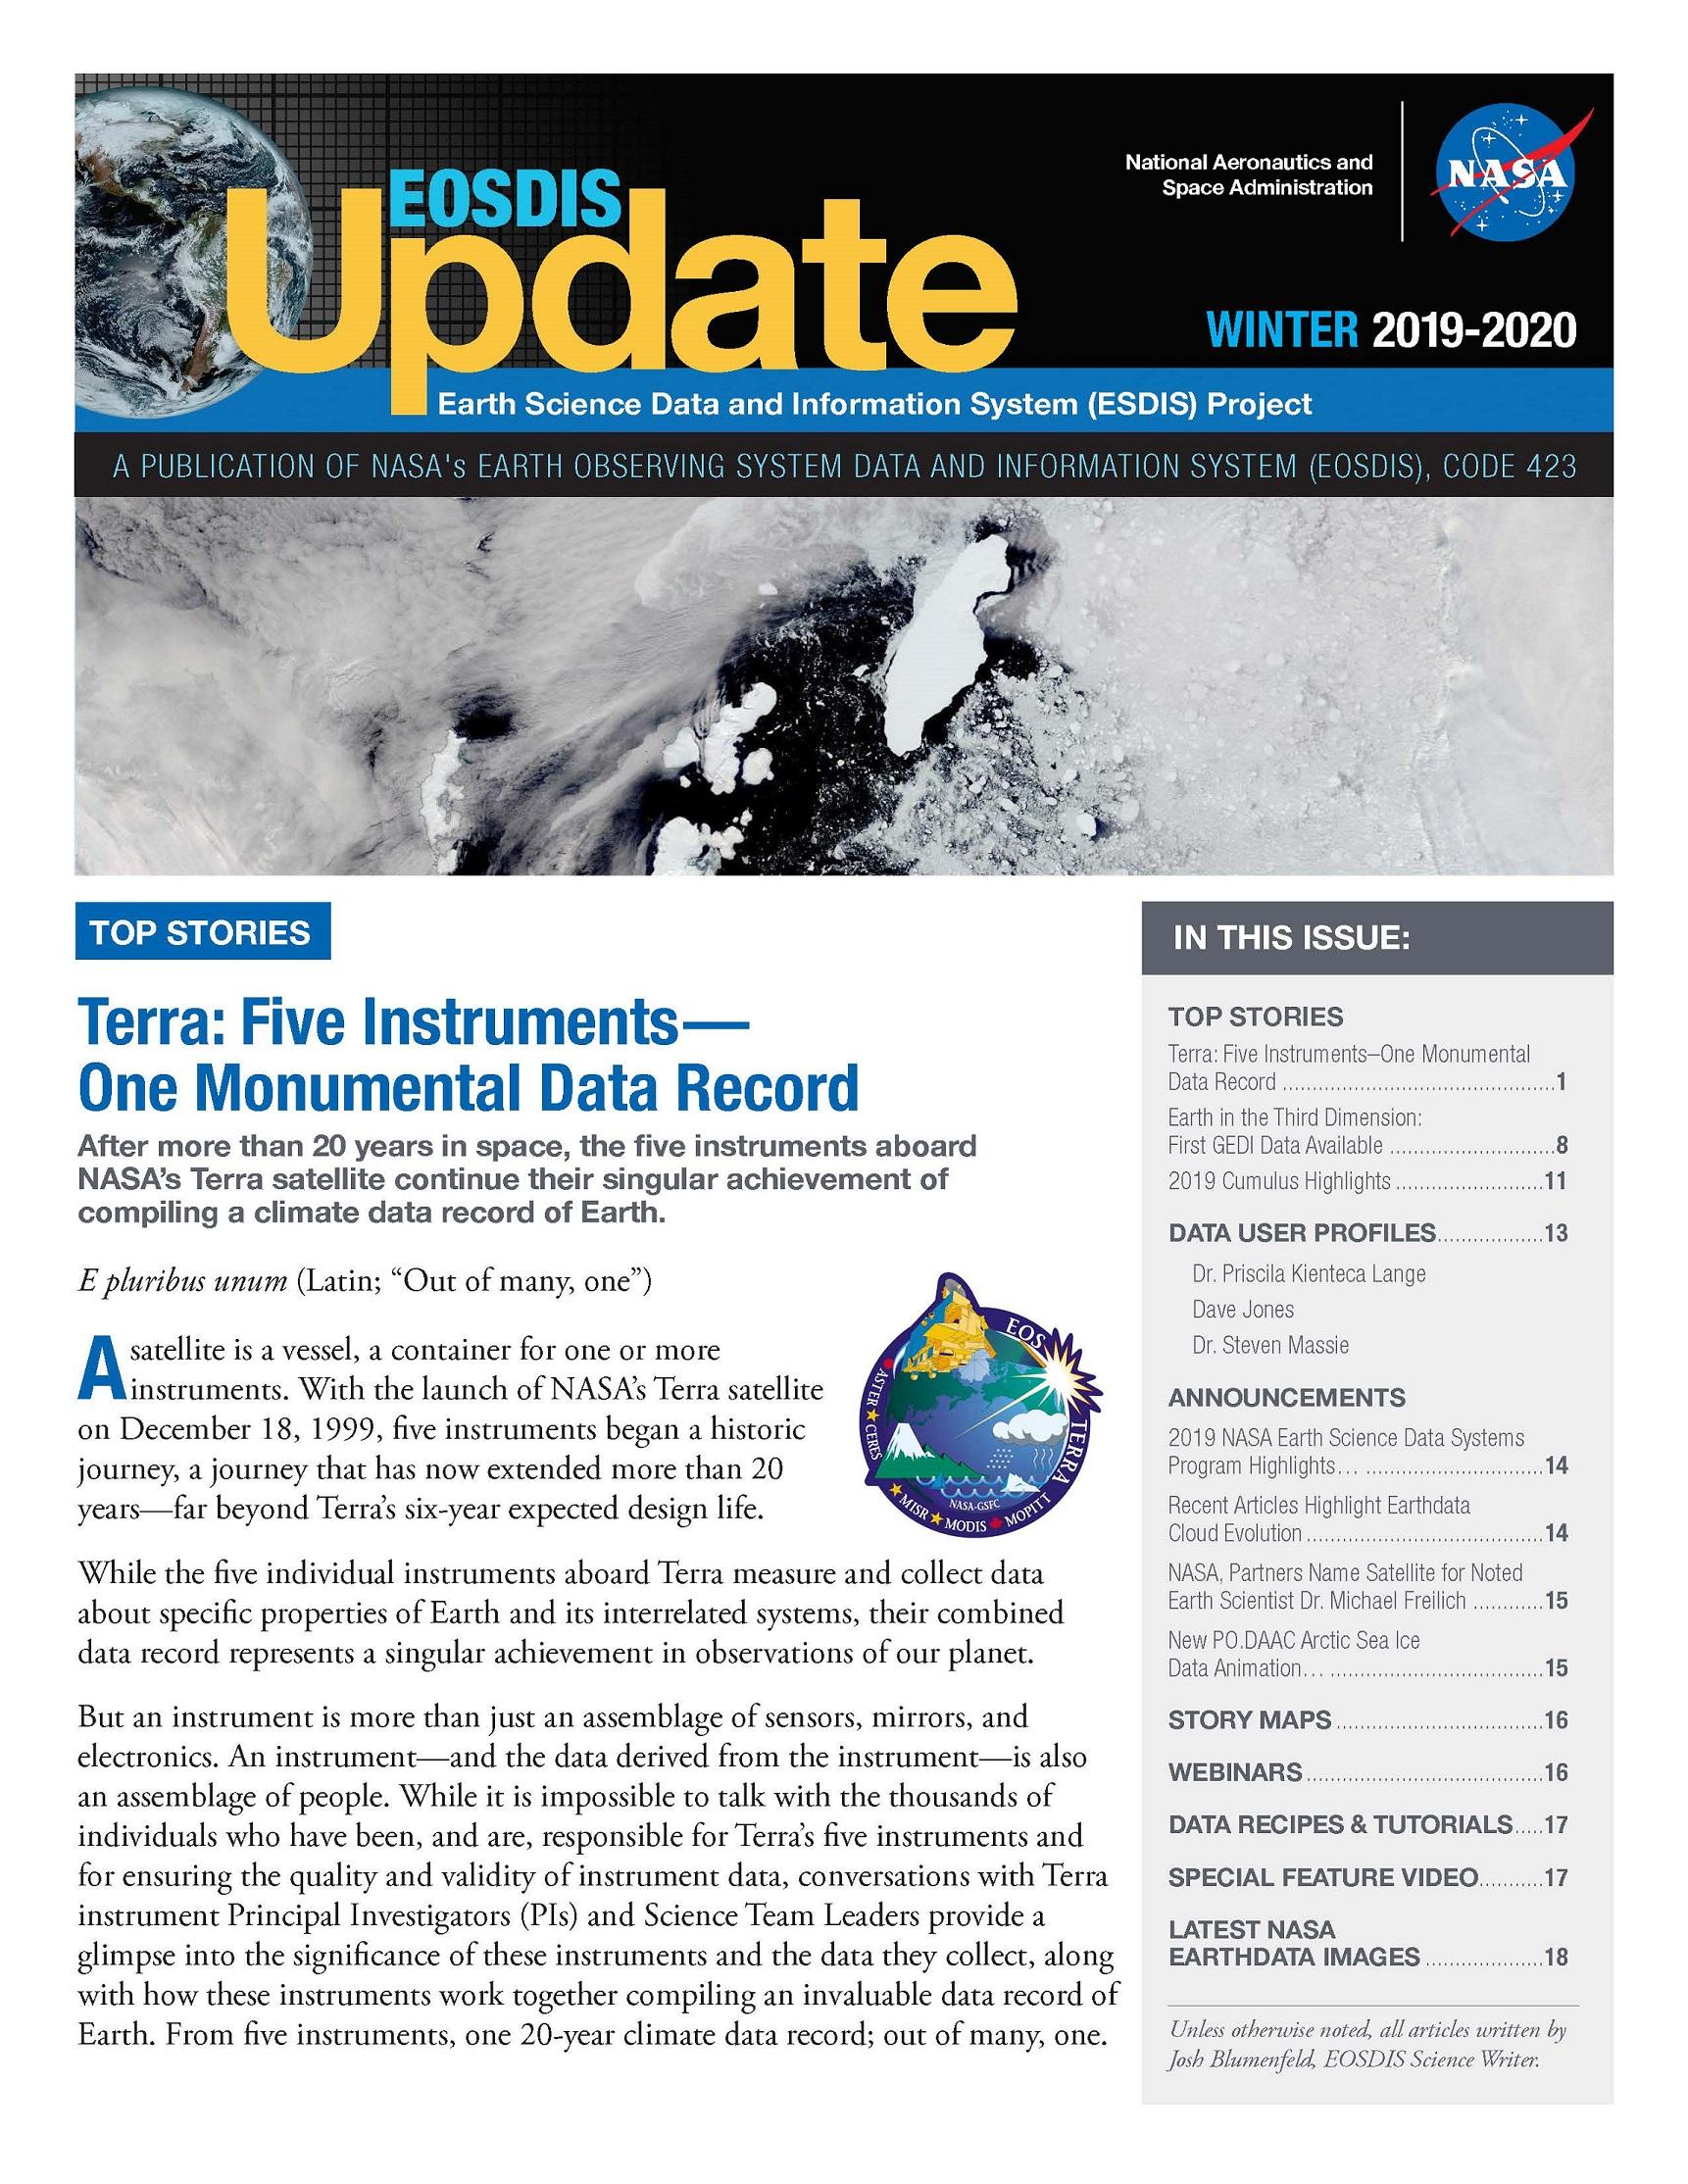 Cover- EOSDIS Update Winter 2019/2020 Newsletter Image